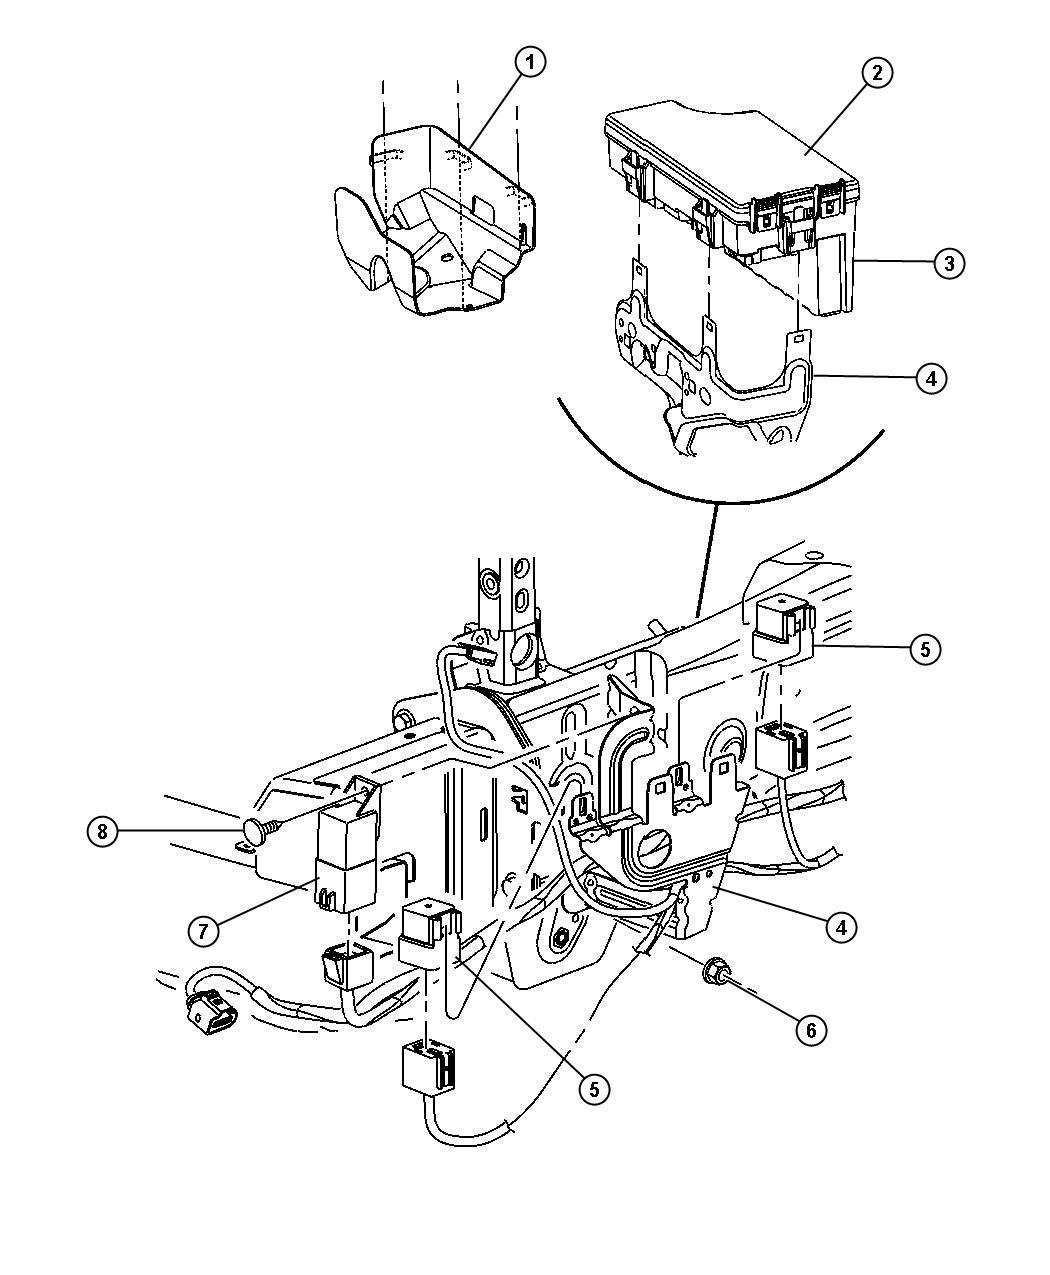 dodge caliber alternator wiring diagram 2001 chevy trailblazer radio jeep patriot location get free image